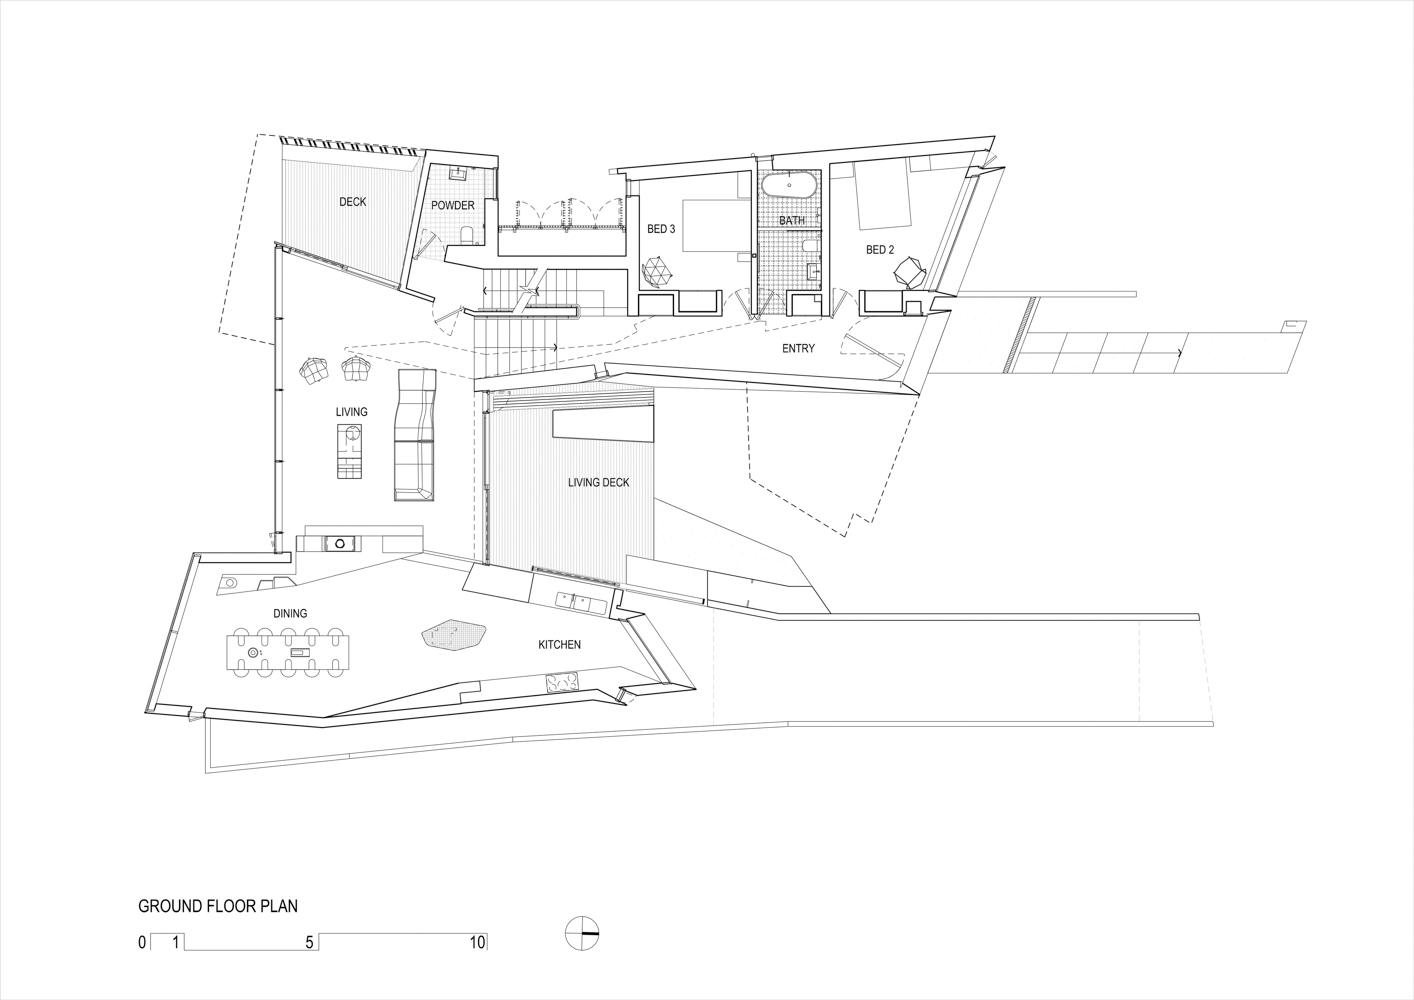 fairhaven-beach-house-john-wardle-architects-the-design-emotive-09.jpg